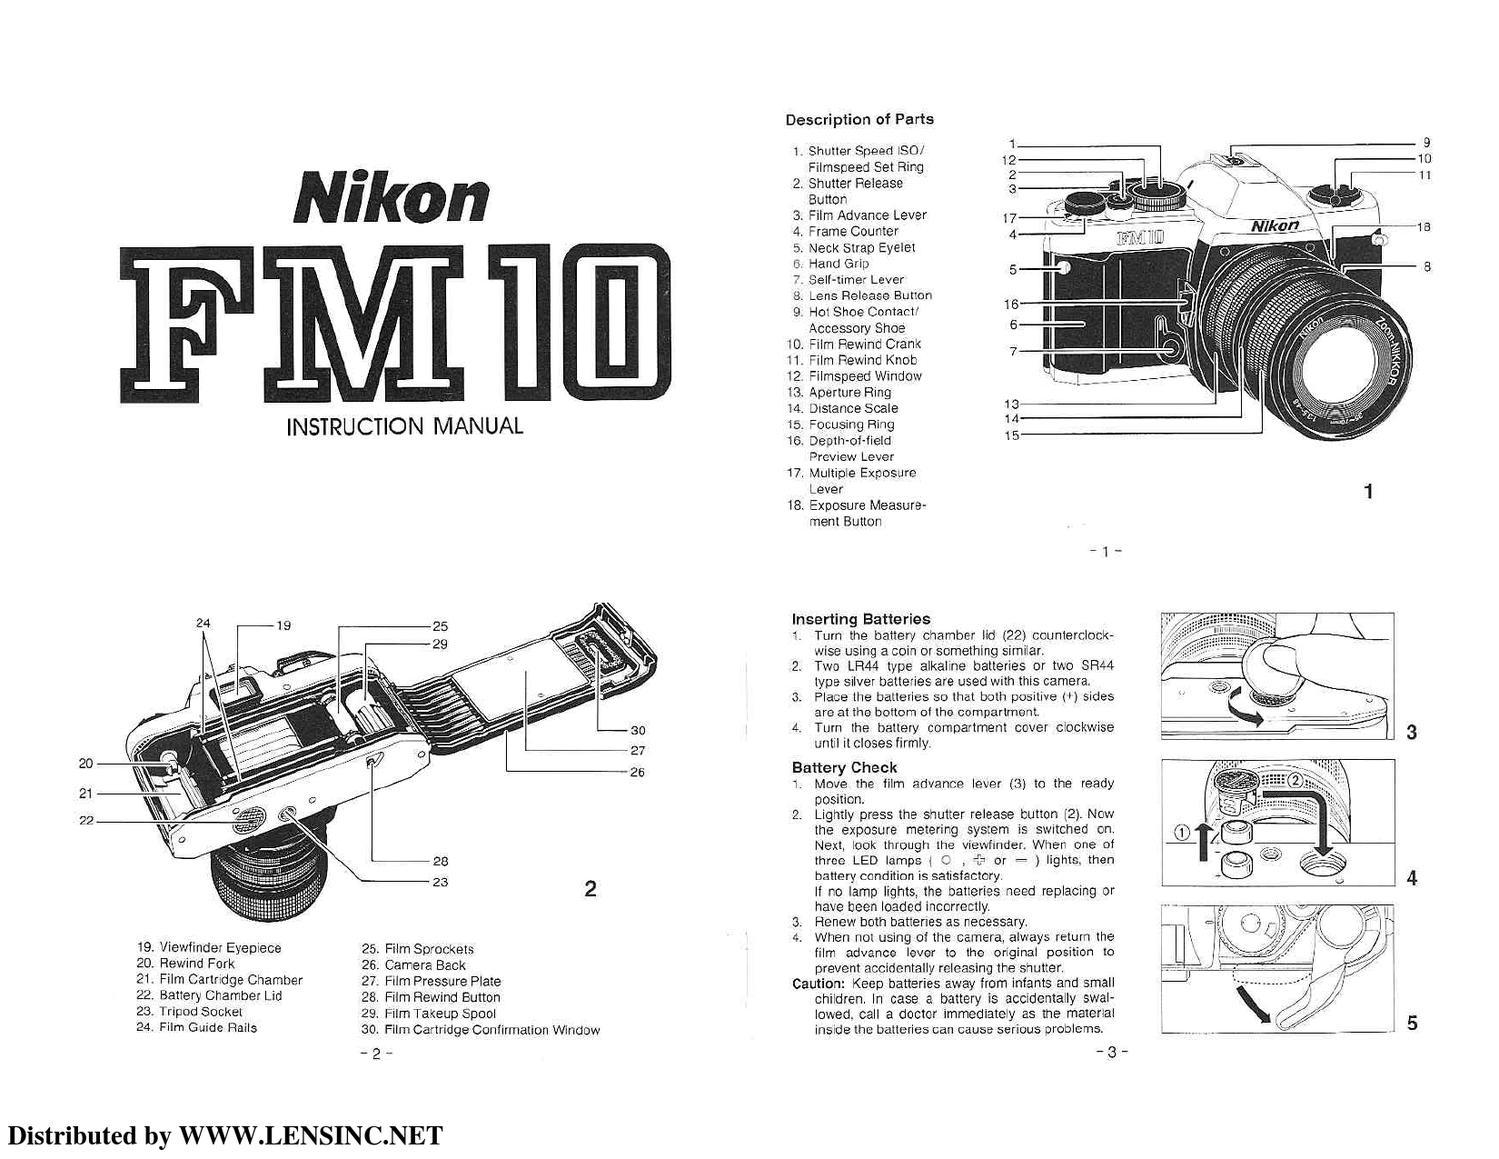 nikon fm10 instruction manual professional user manual ebooks u2022 rh gogradresumes com nikon fm10 user manual pdf nikon fm10 user manual